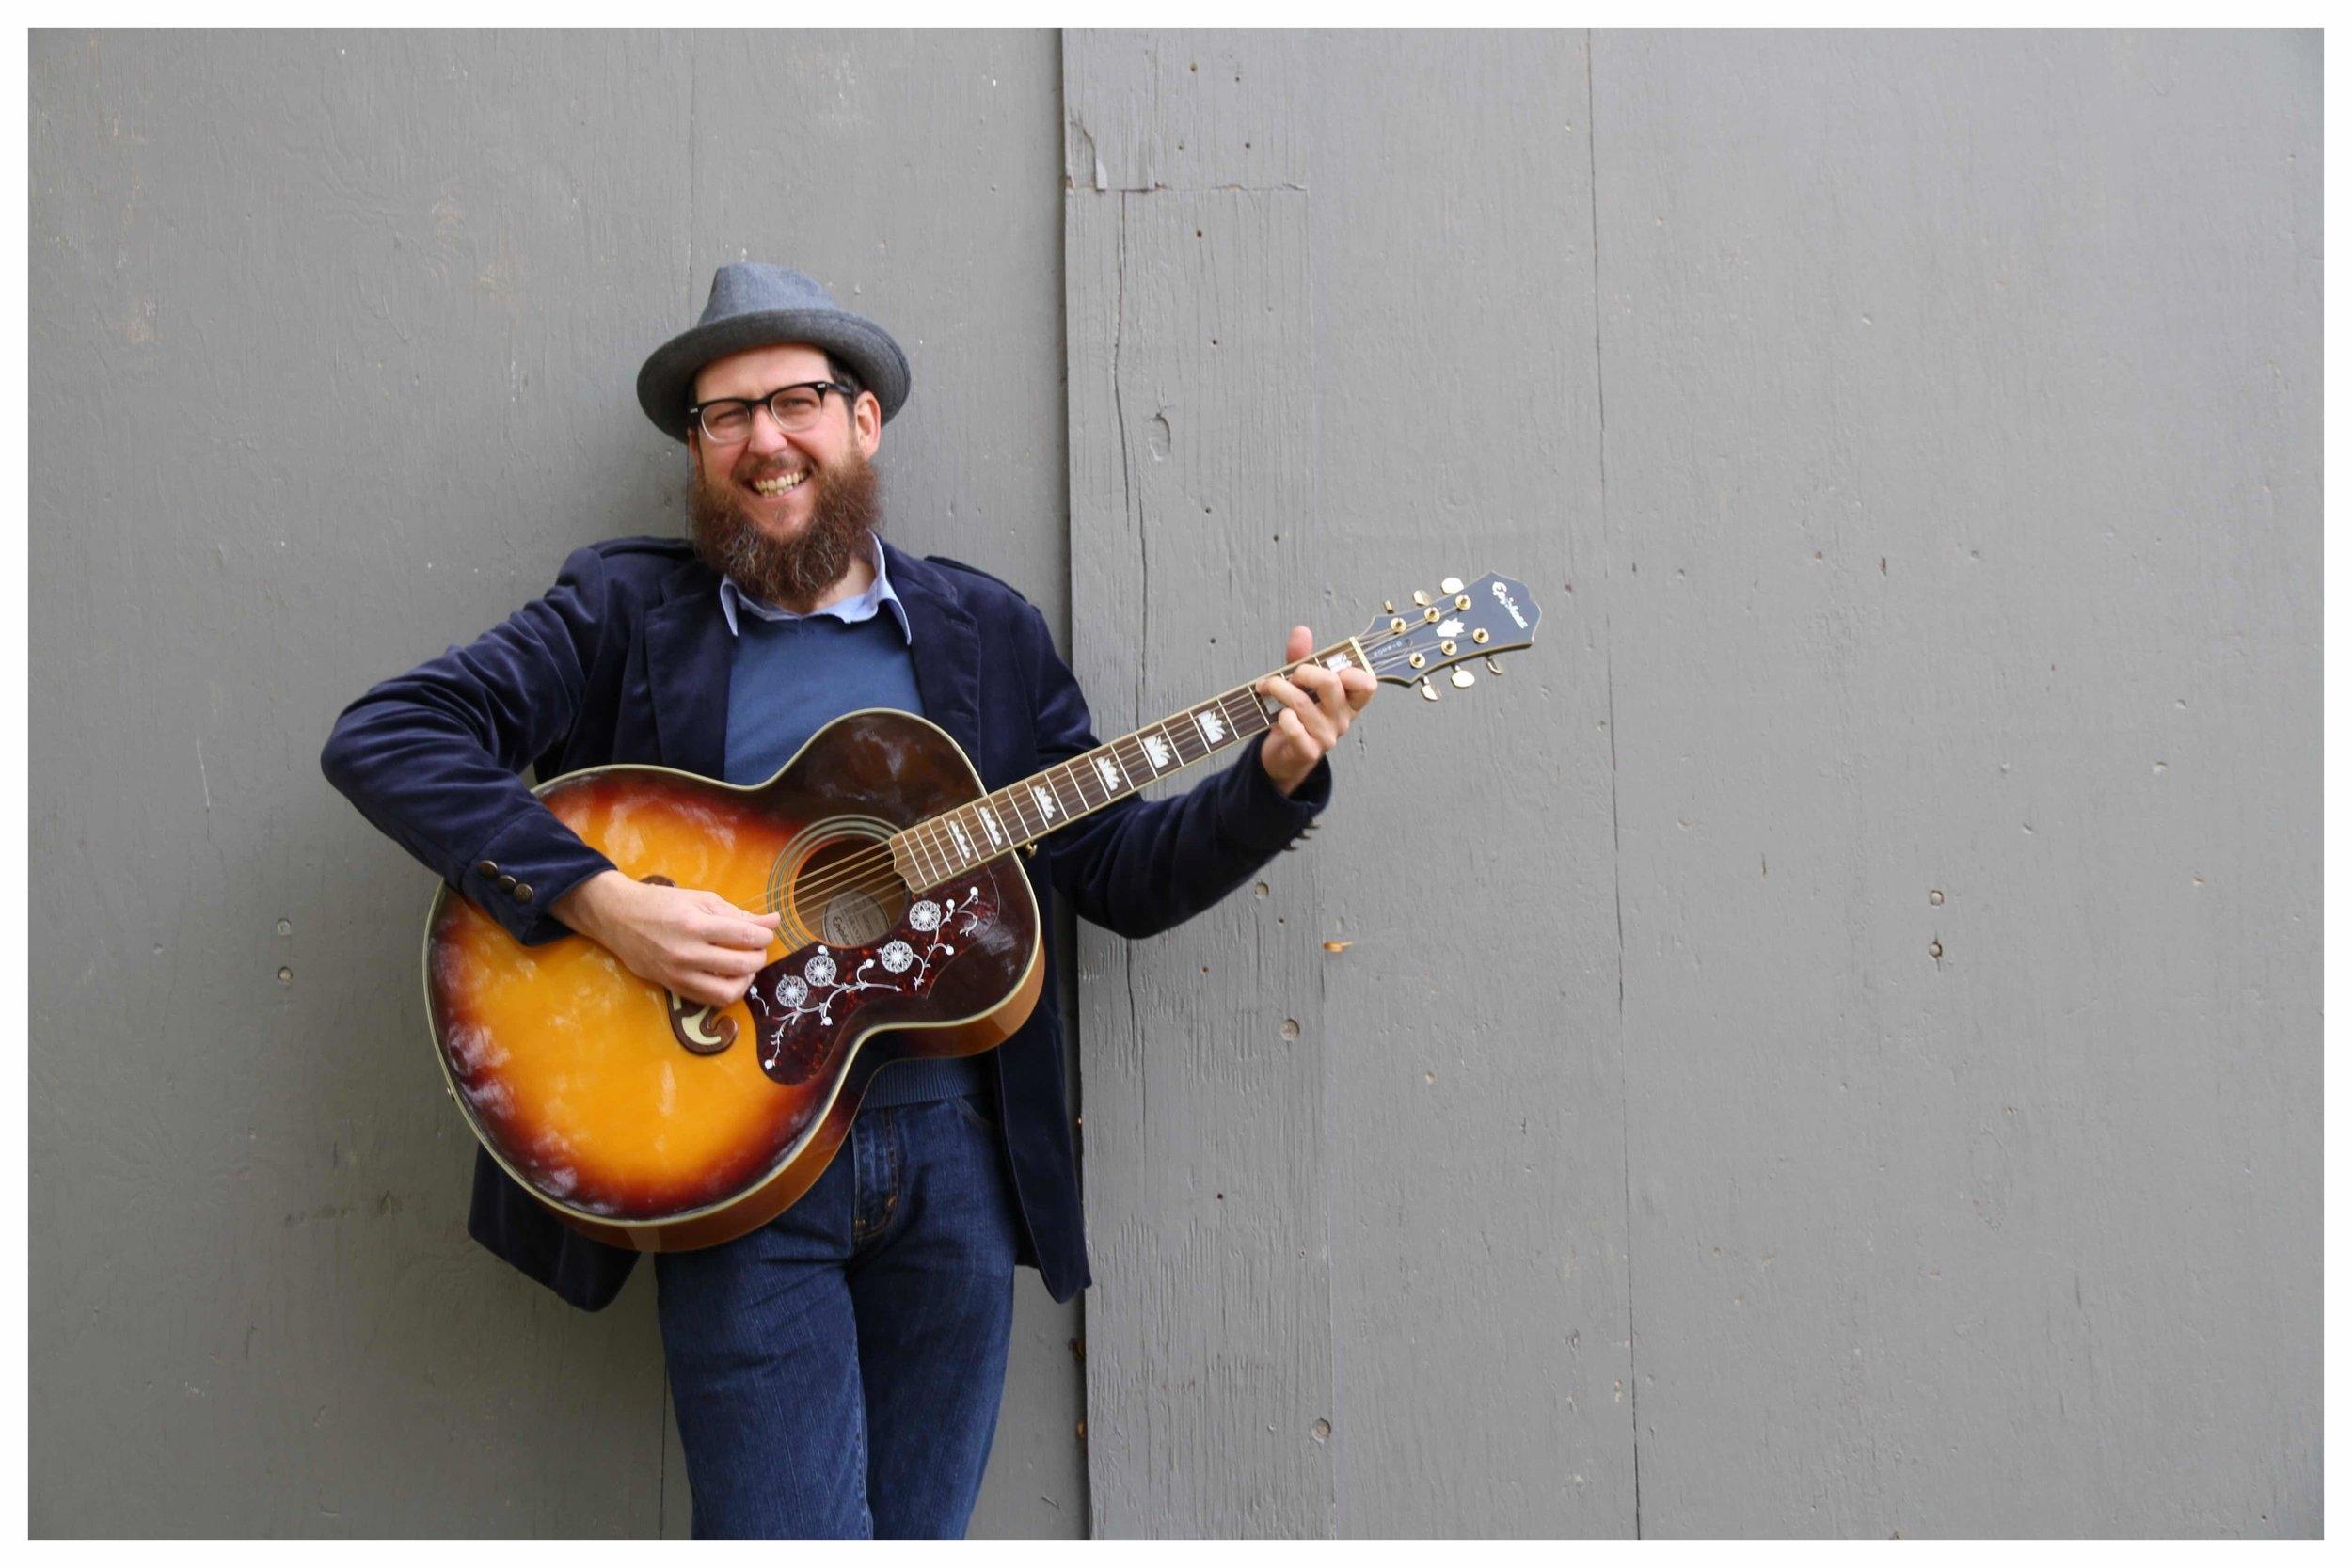 Greg Promo Guitar Smile.jpg